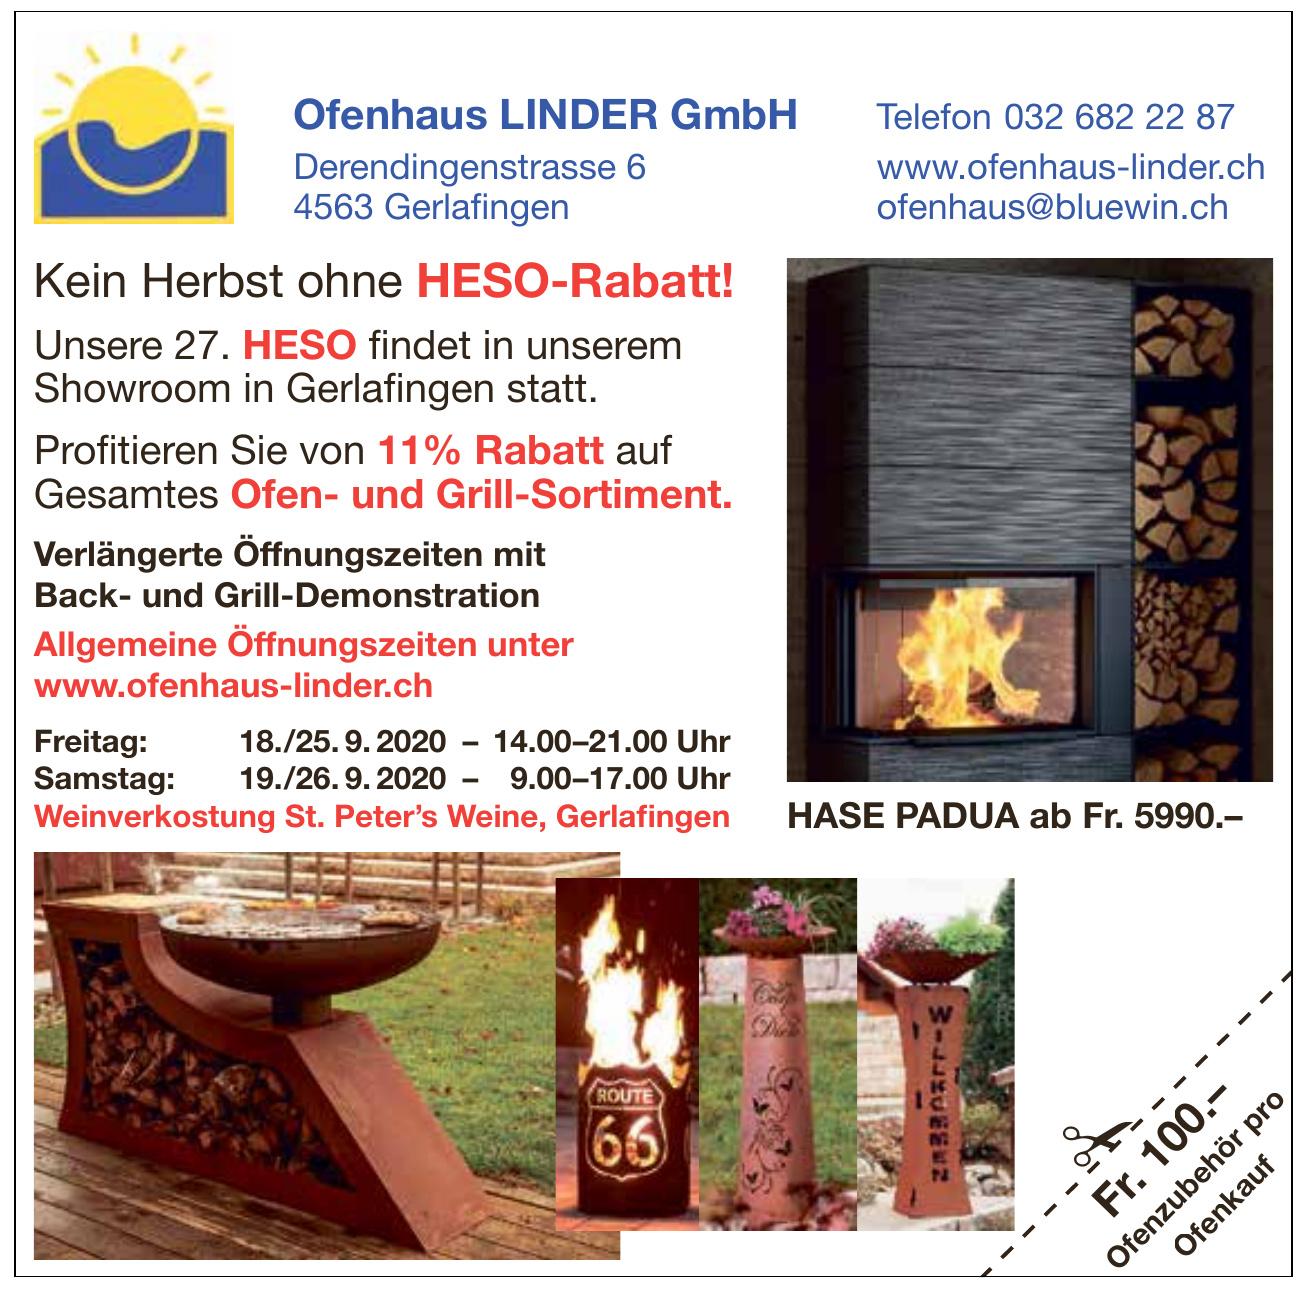 Ofenhaus Linder GmbH